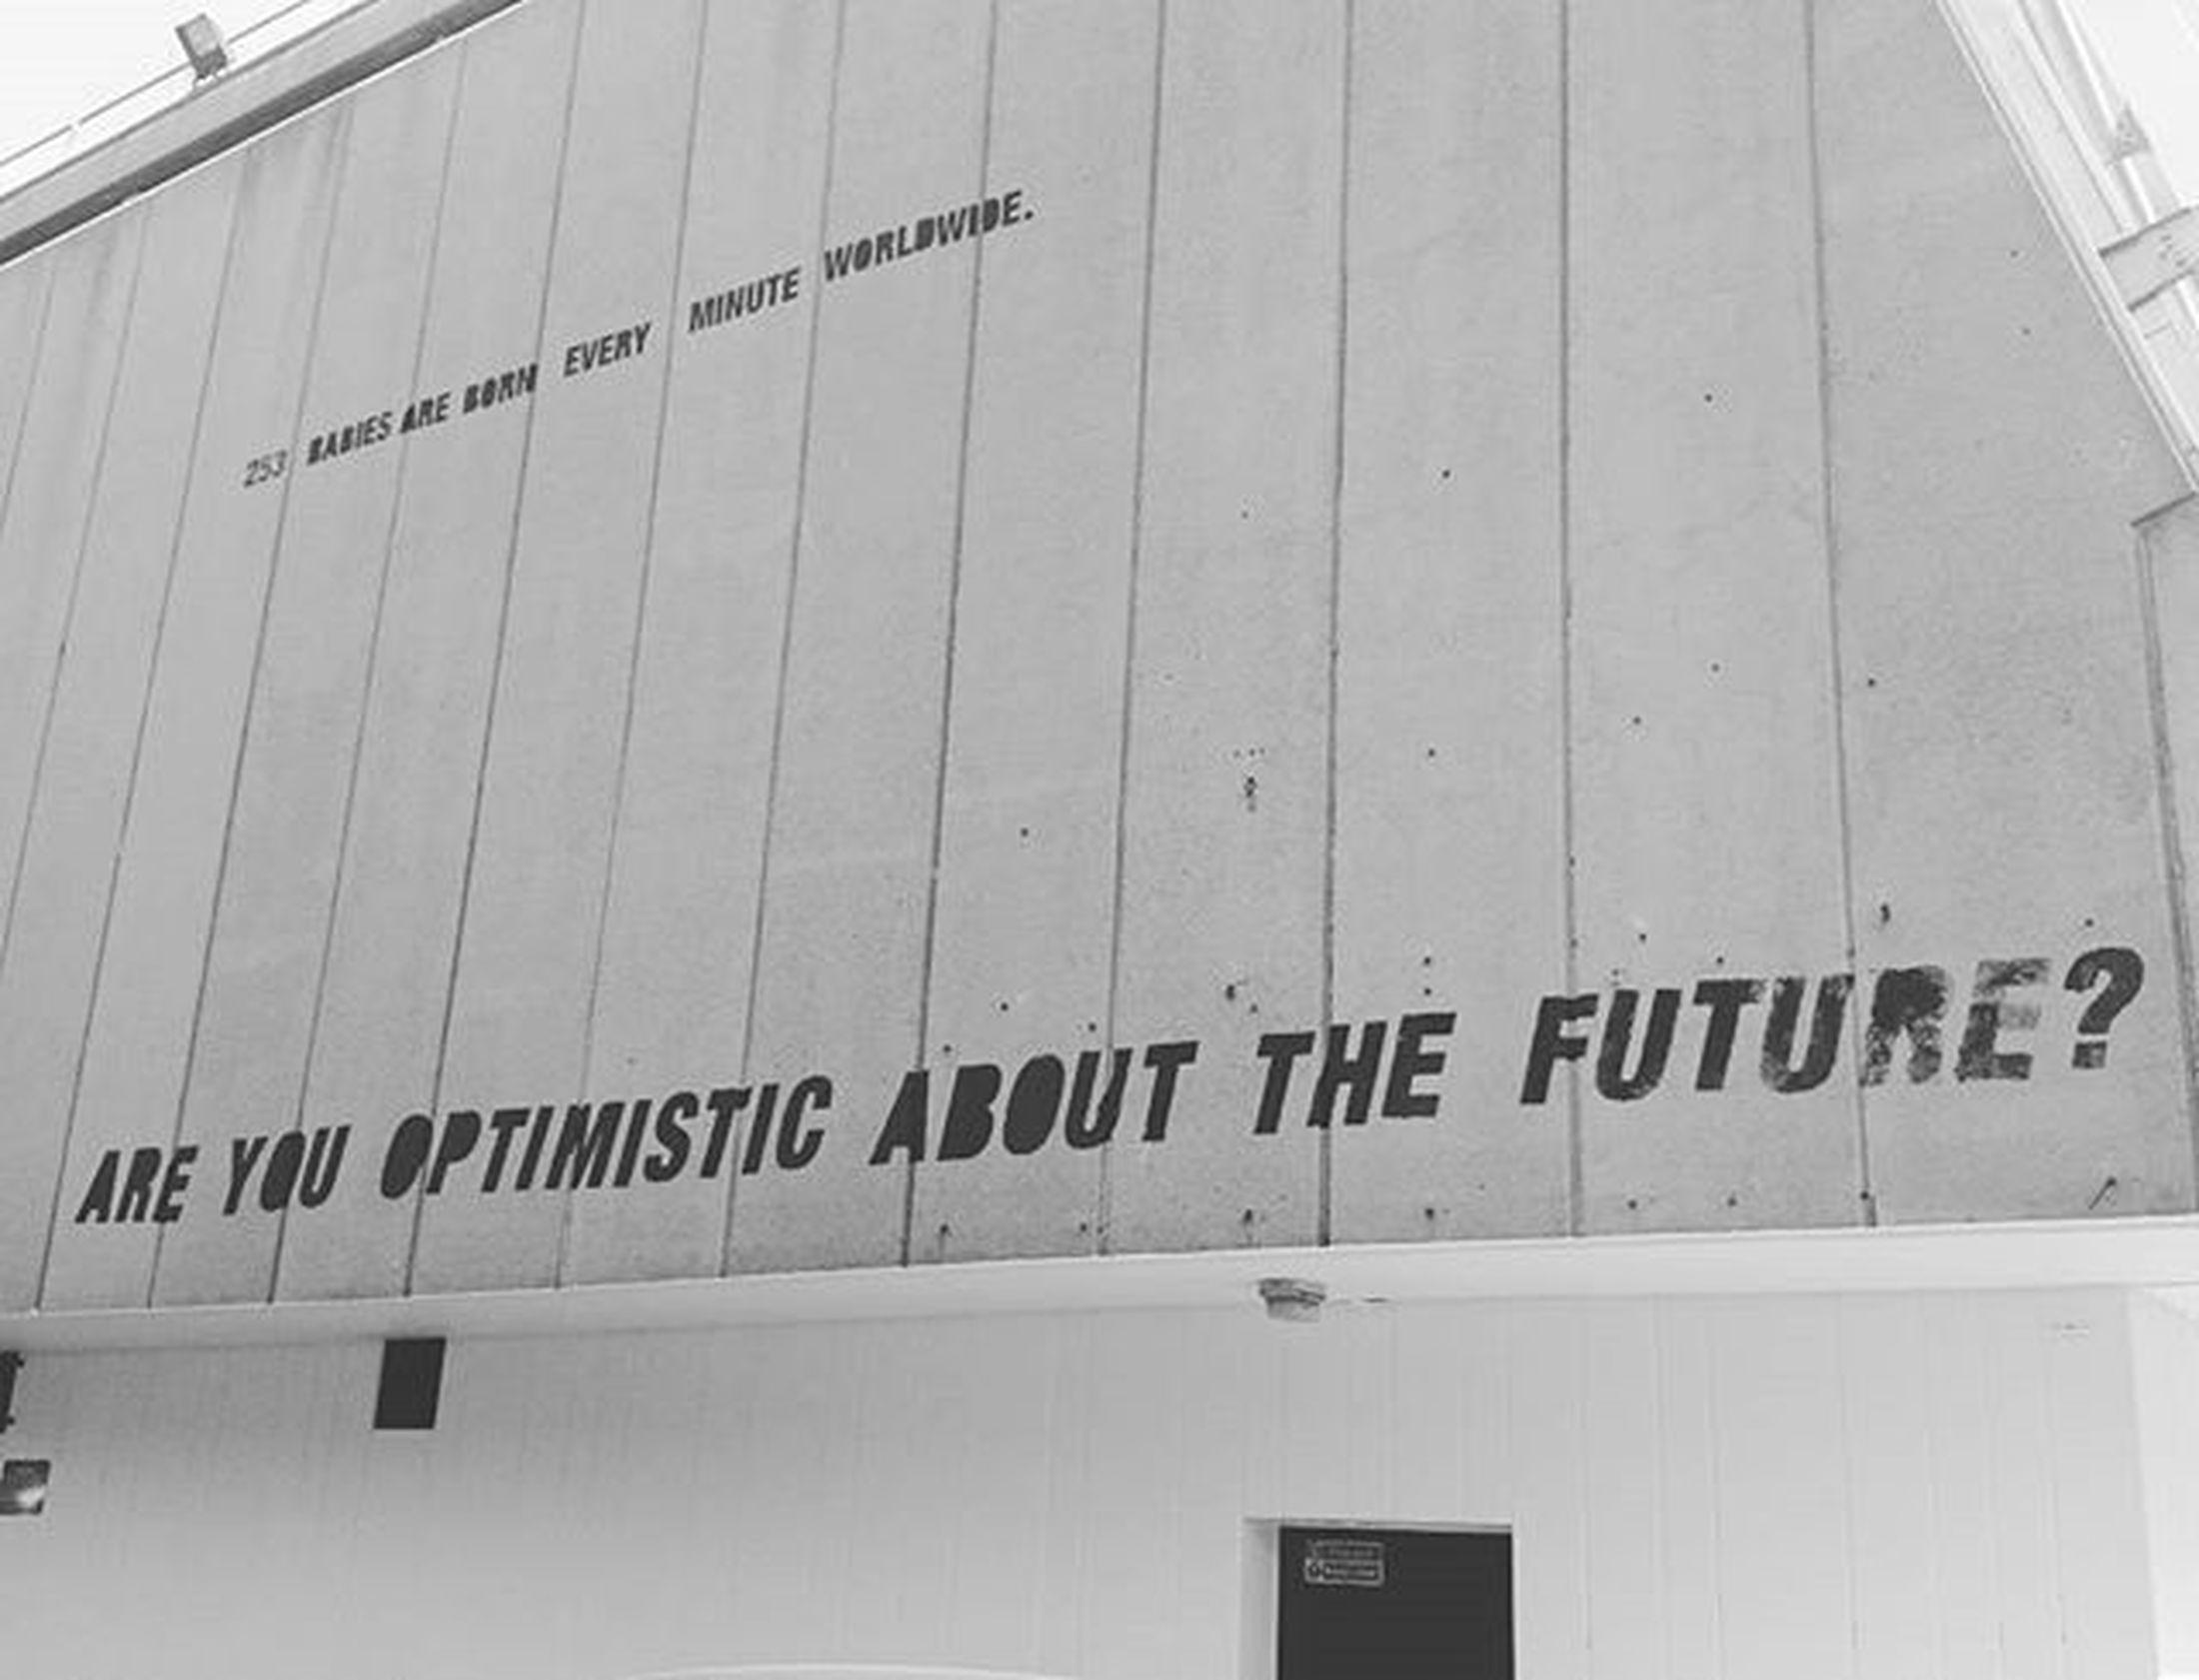 Visto lo visto no. Blackandwhite Grey Message Wall Liverpool England Future Uncertainty  Optimism Pessimism Questionyourself Muro  Mensaje Futuro Gris